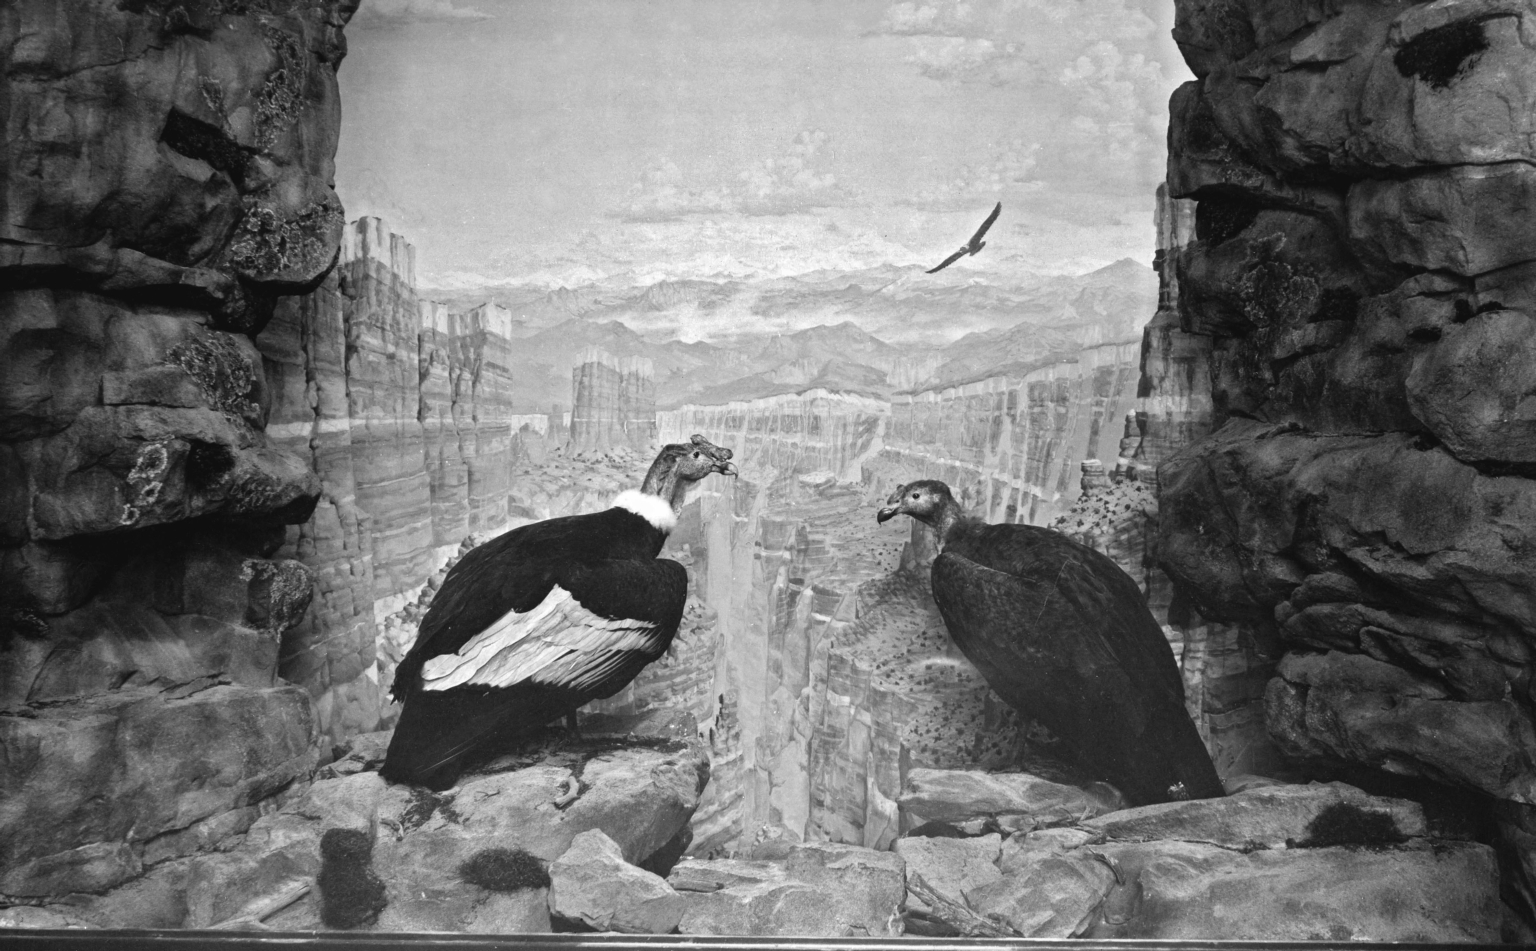 South American Condor Group